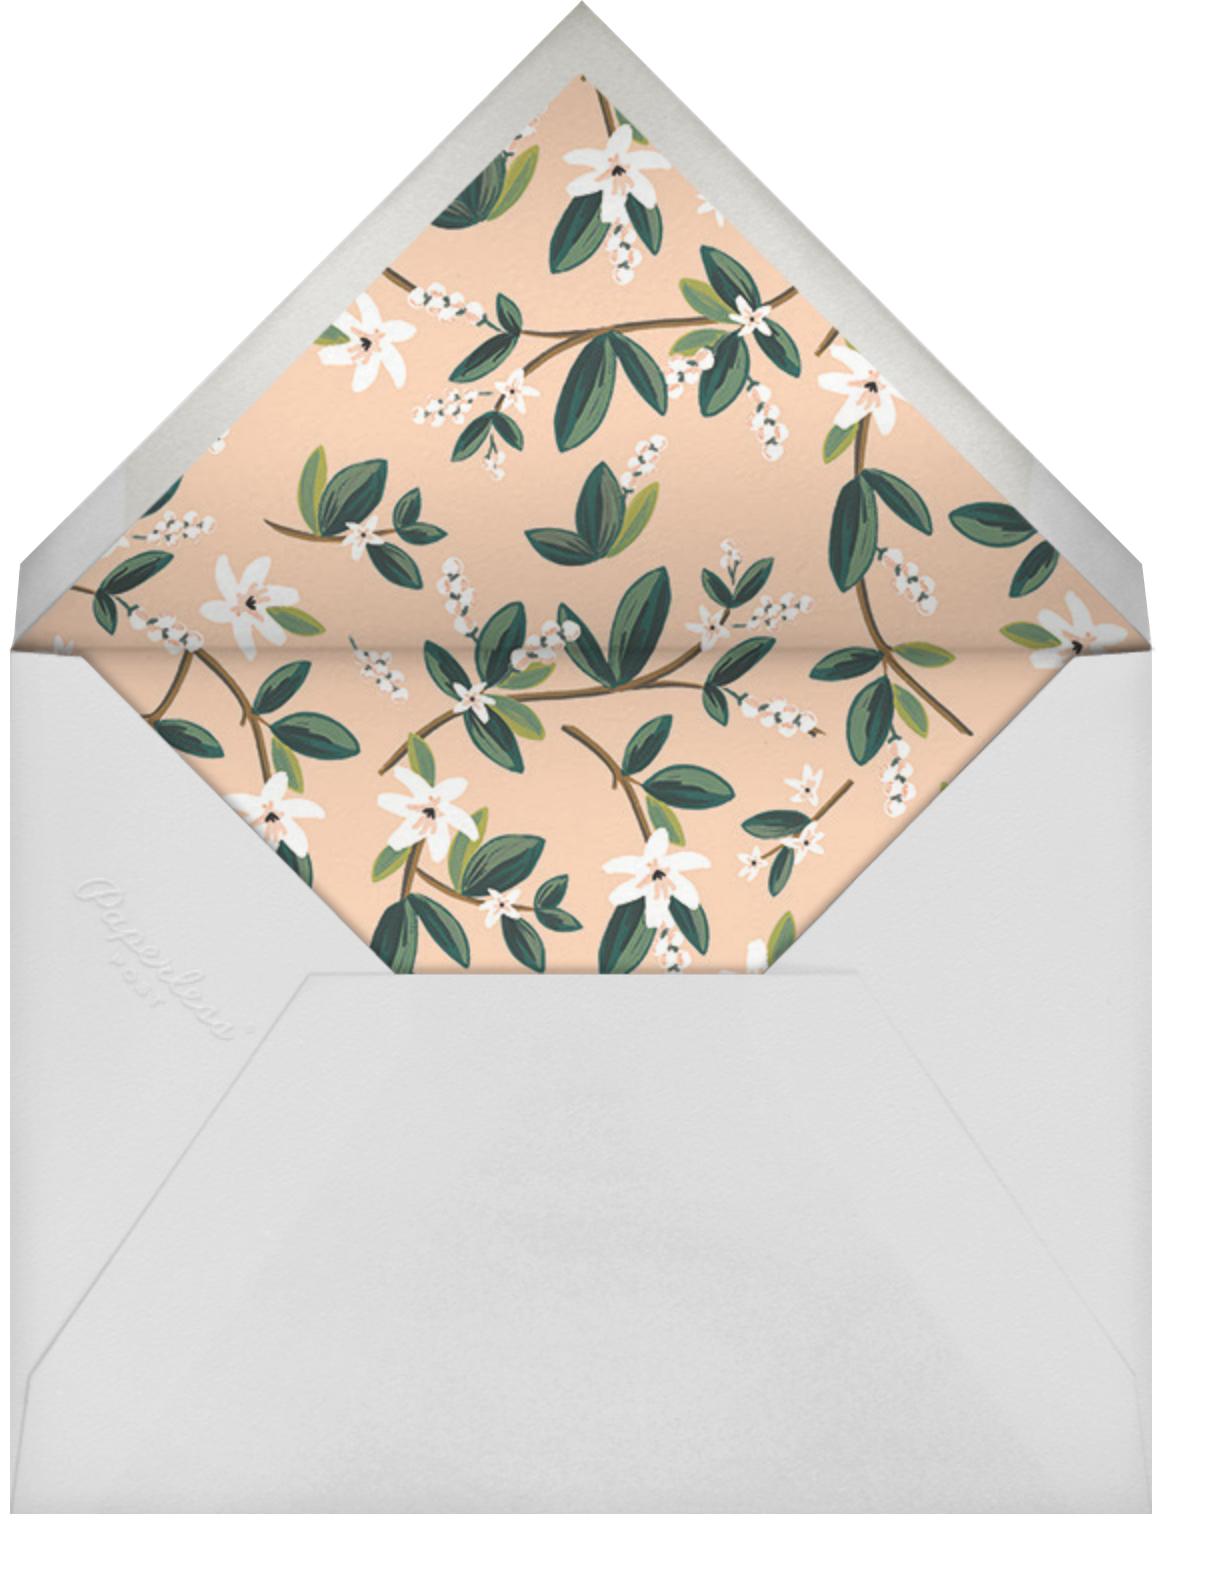 November Herbarium (Square) - Rifle Paper Co. - Graduation thank you cards - envelope back